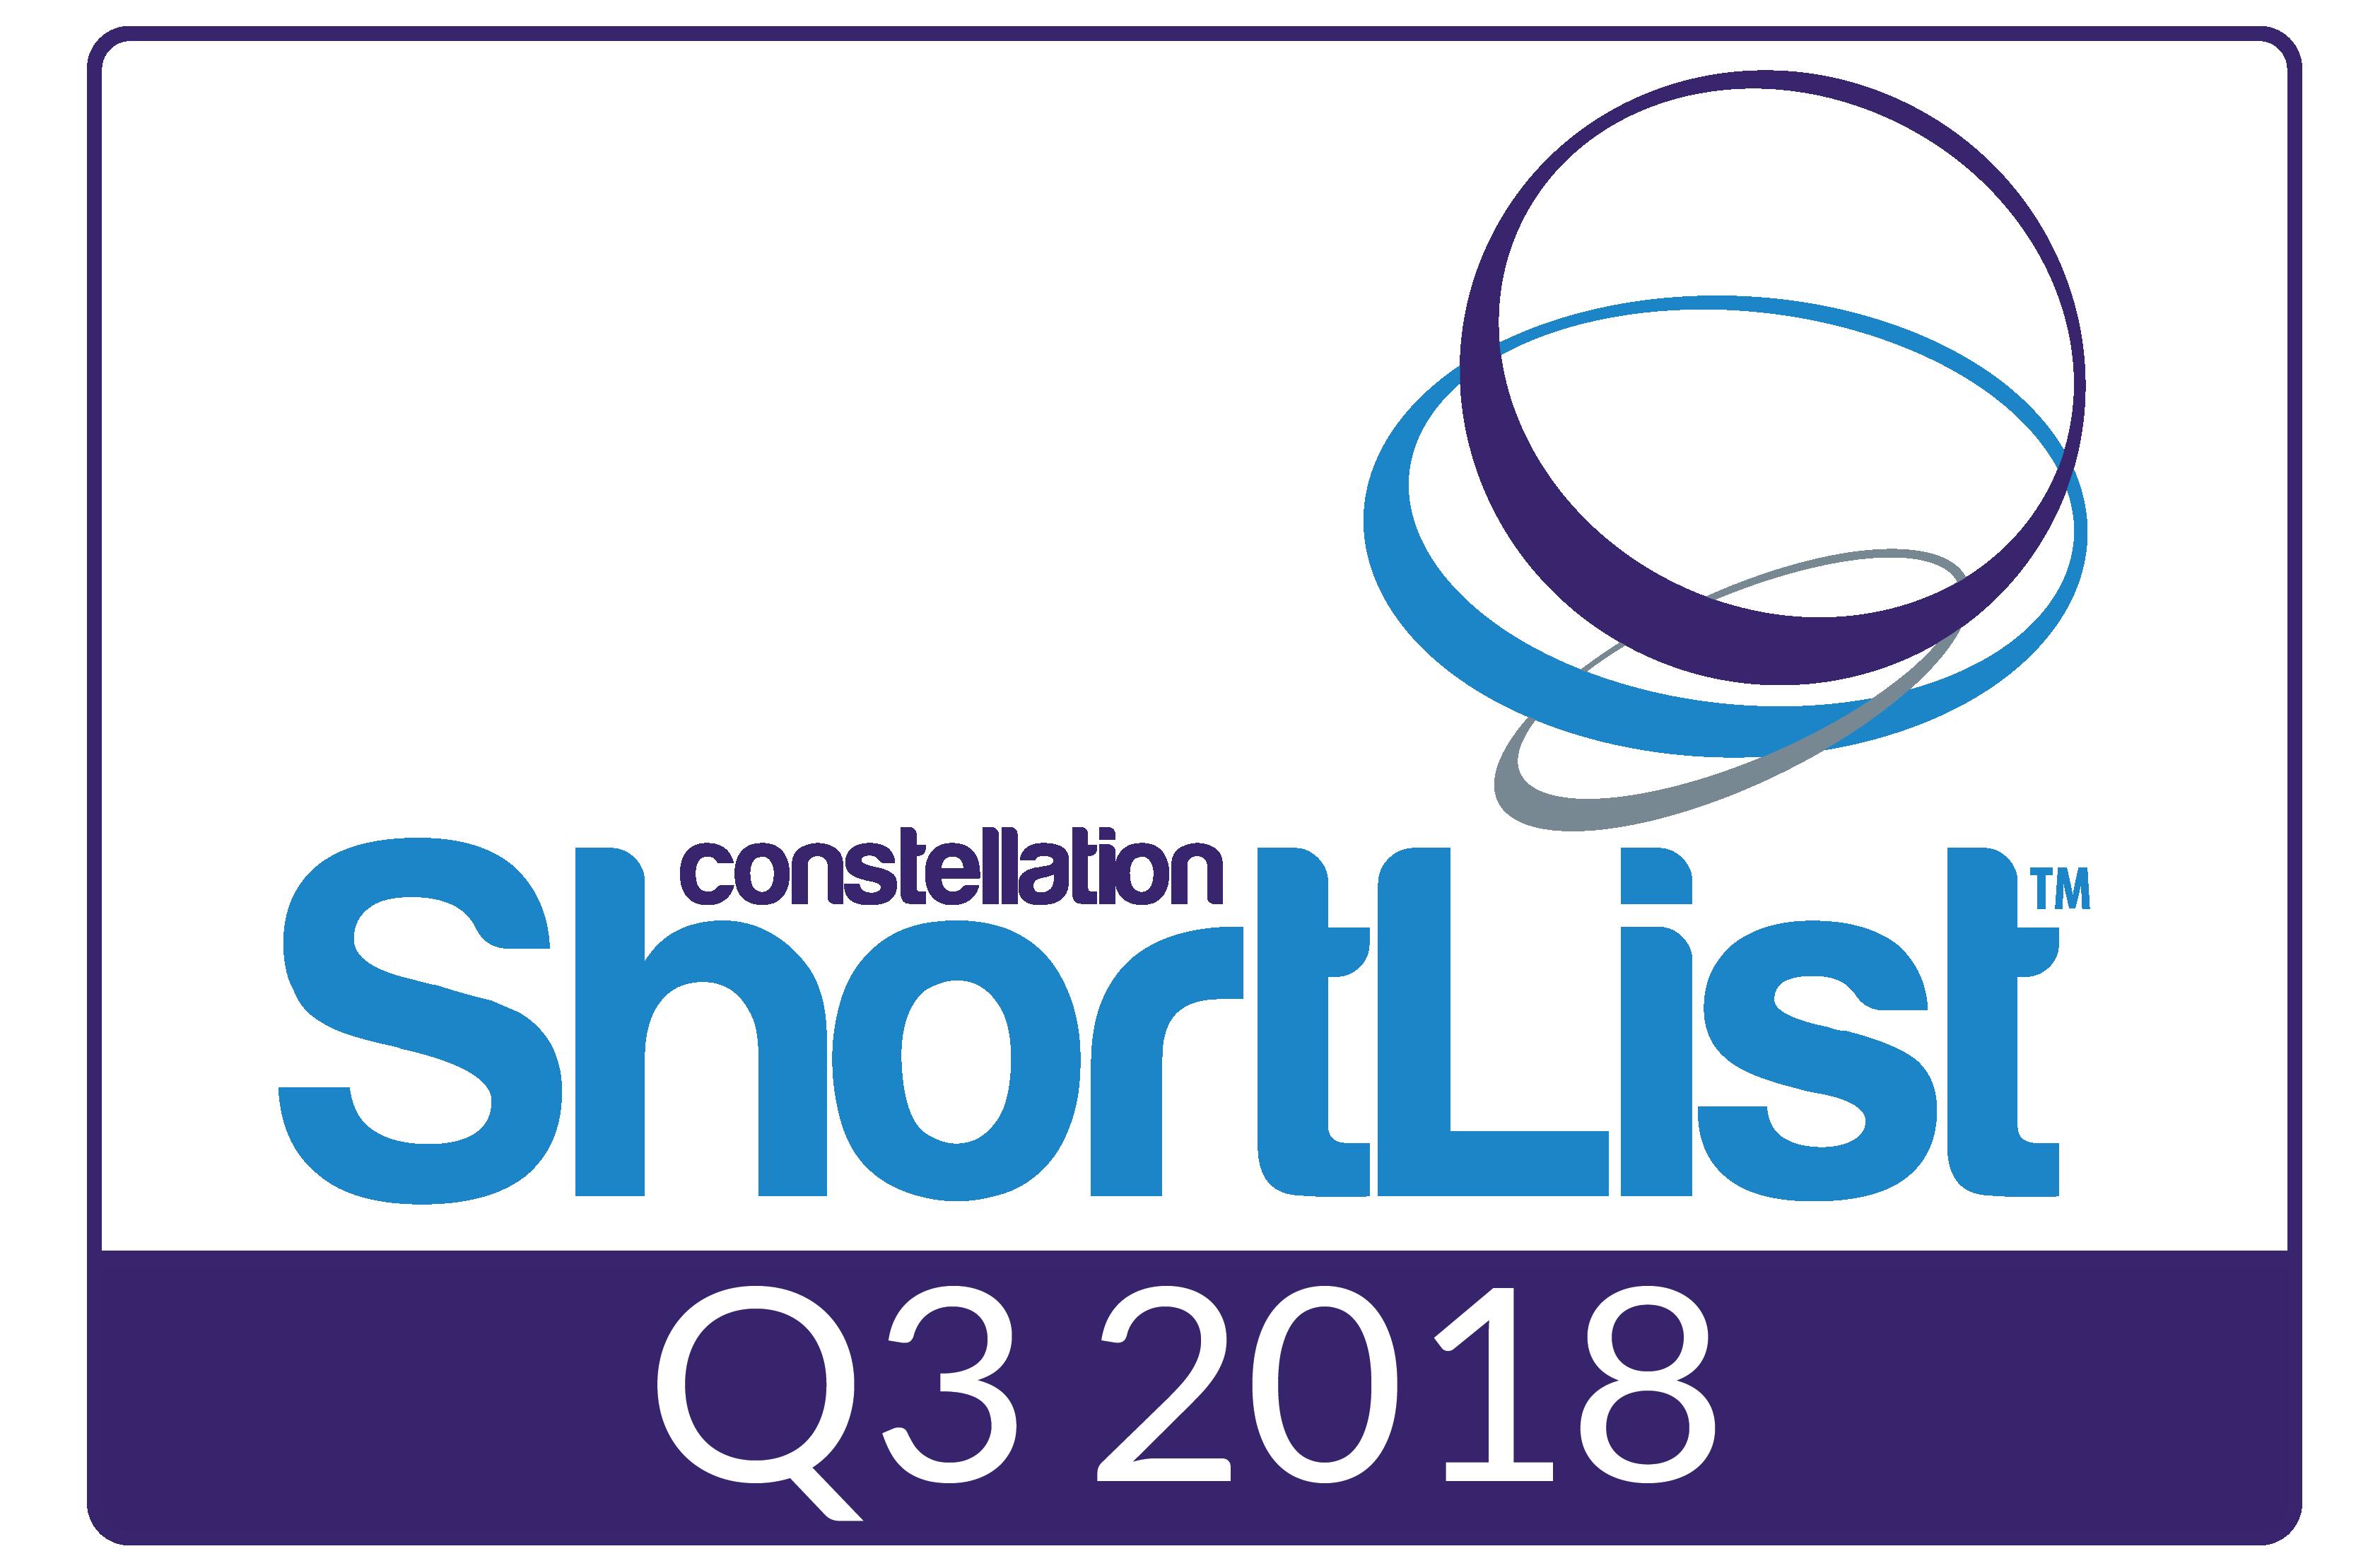 cr shortlist member badge Q3 2018-01